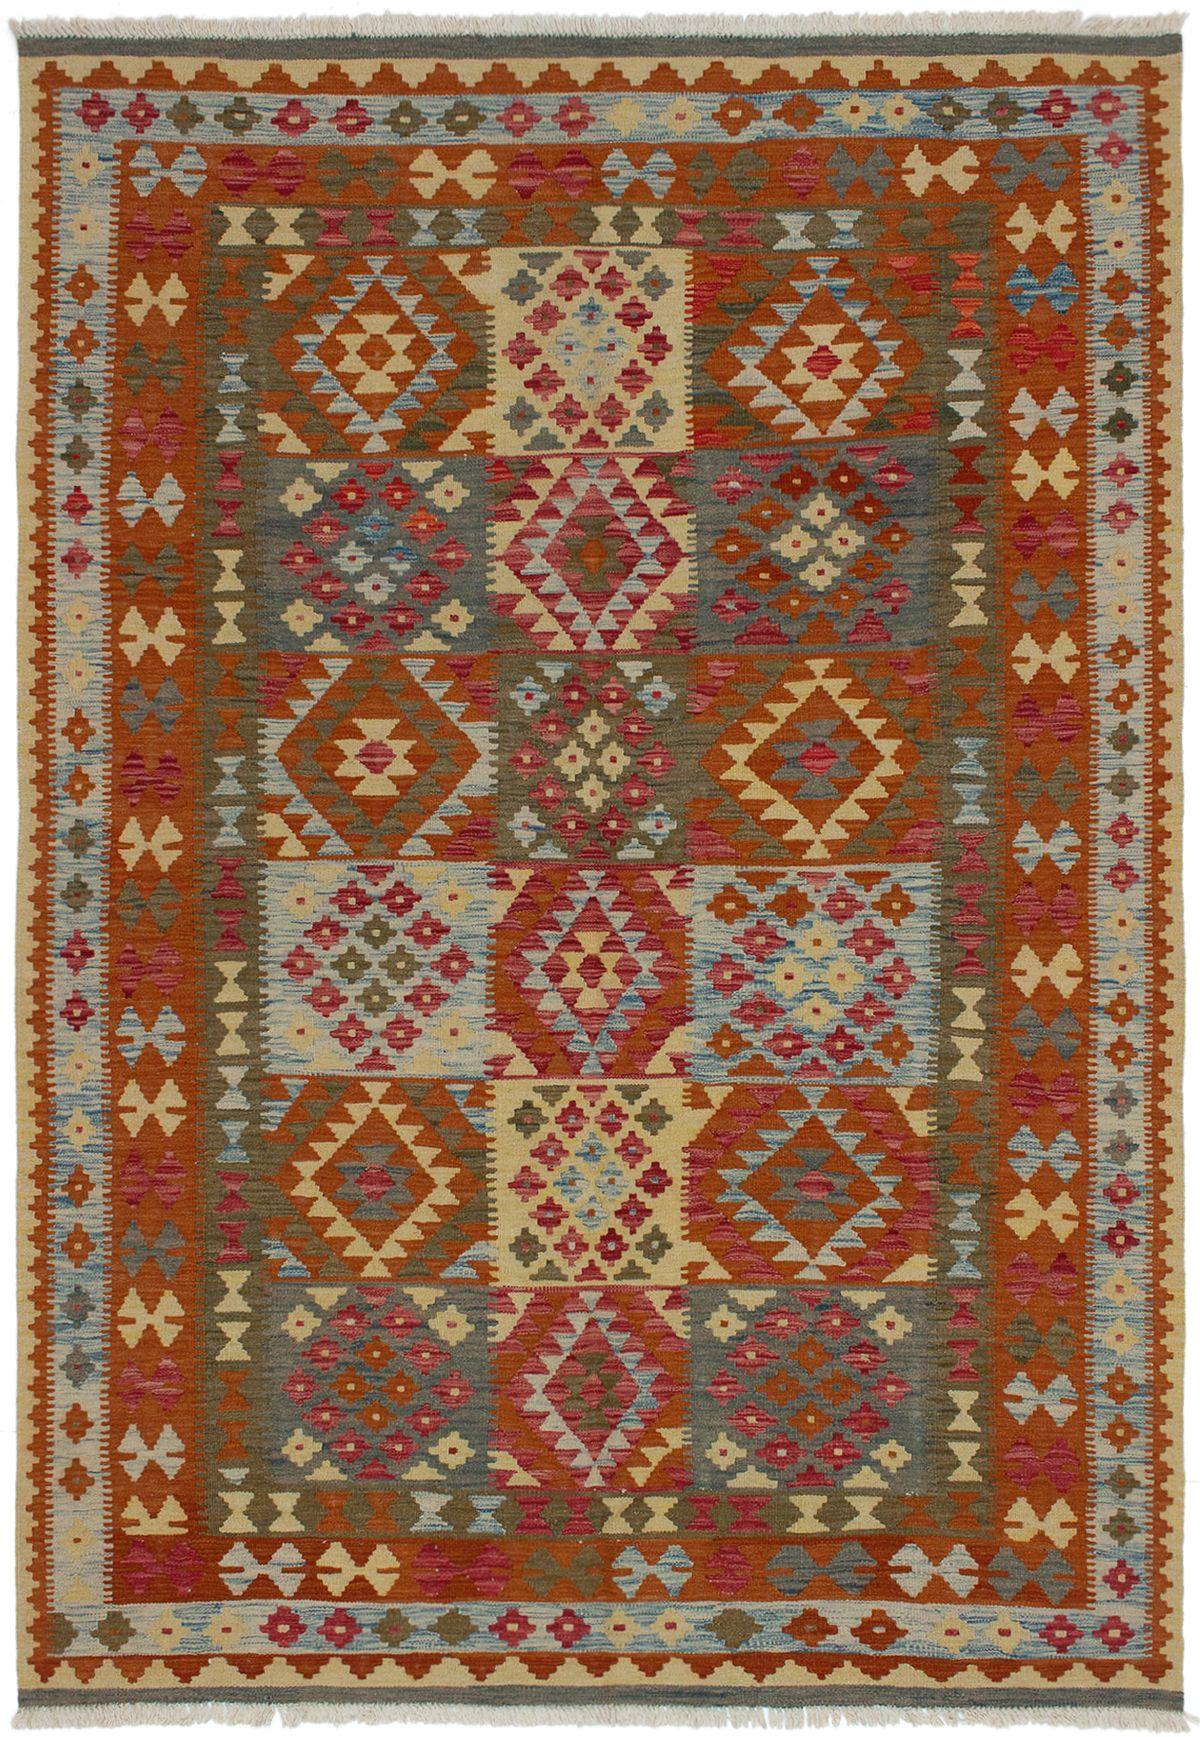 "Hand woven Kashkoli FW Burnt Orange Wool Kilim 6'6"" x 9'8"" Size: 6'6"" x 9'8"""